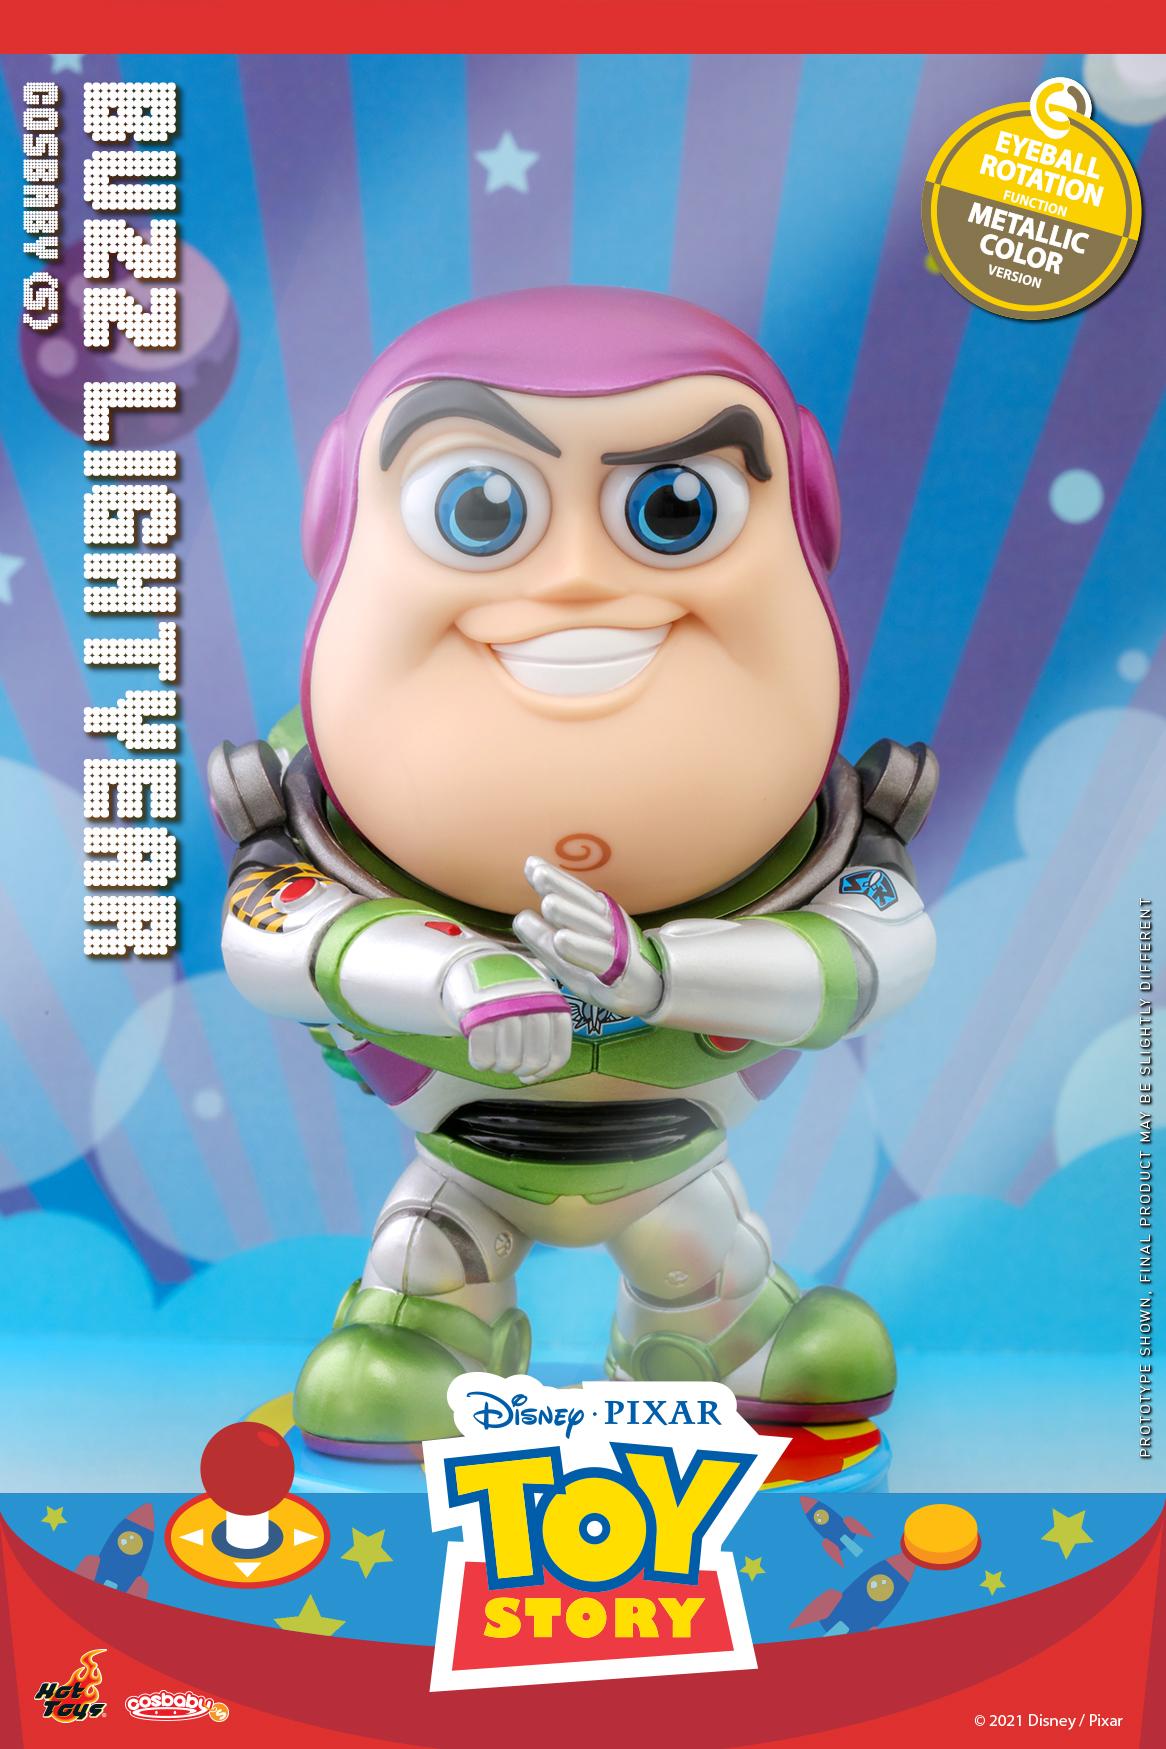 Hot Toys - Toy Story - Buzz Lightyear Cosbaby_PR1